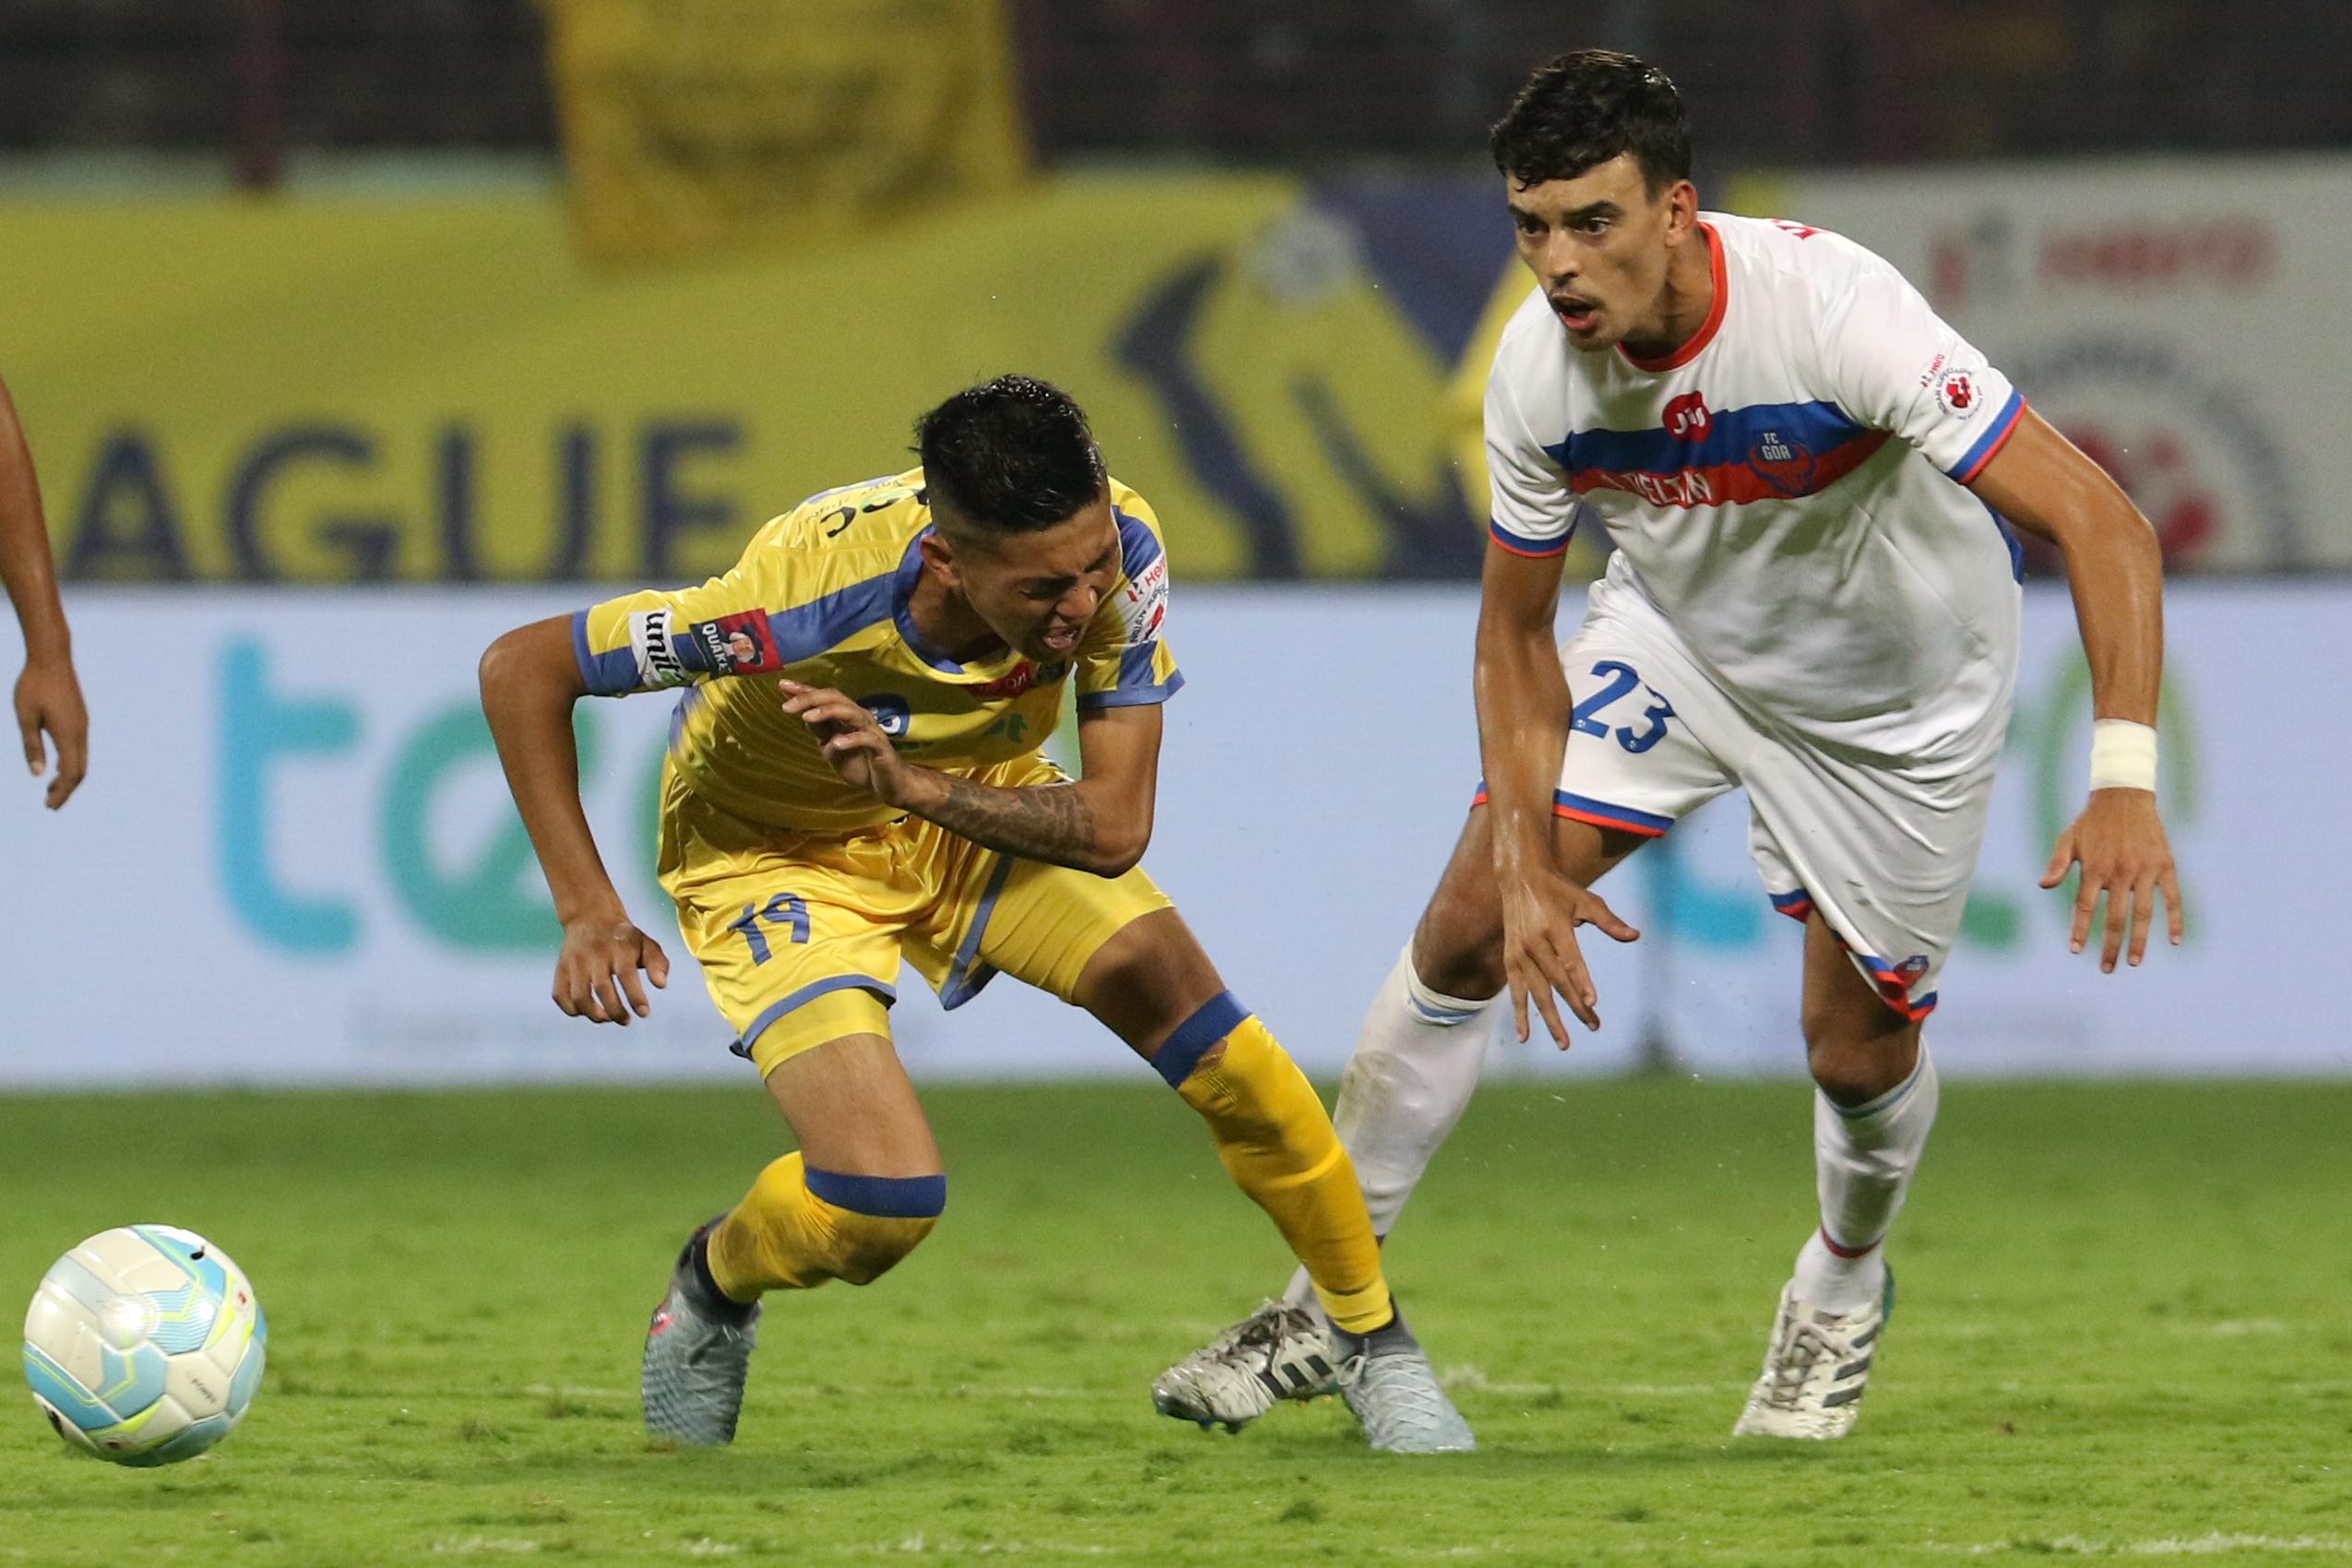 Siam Hangal Kerala Blasters FC Goa 2017-18 ISL